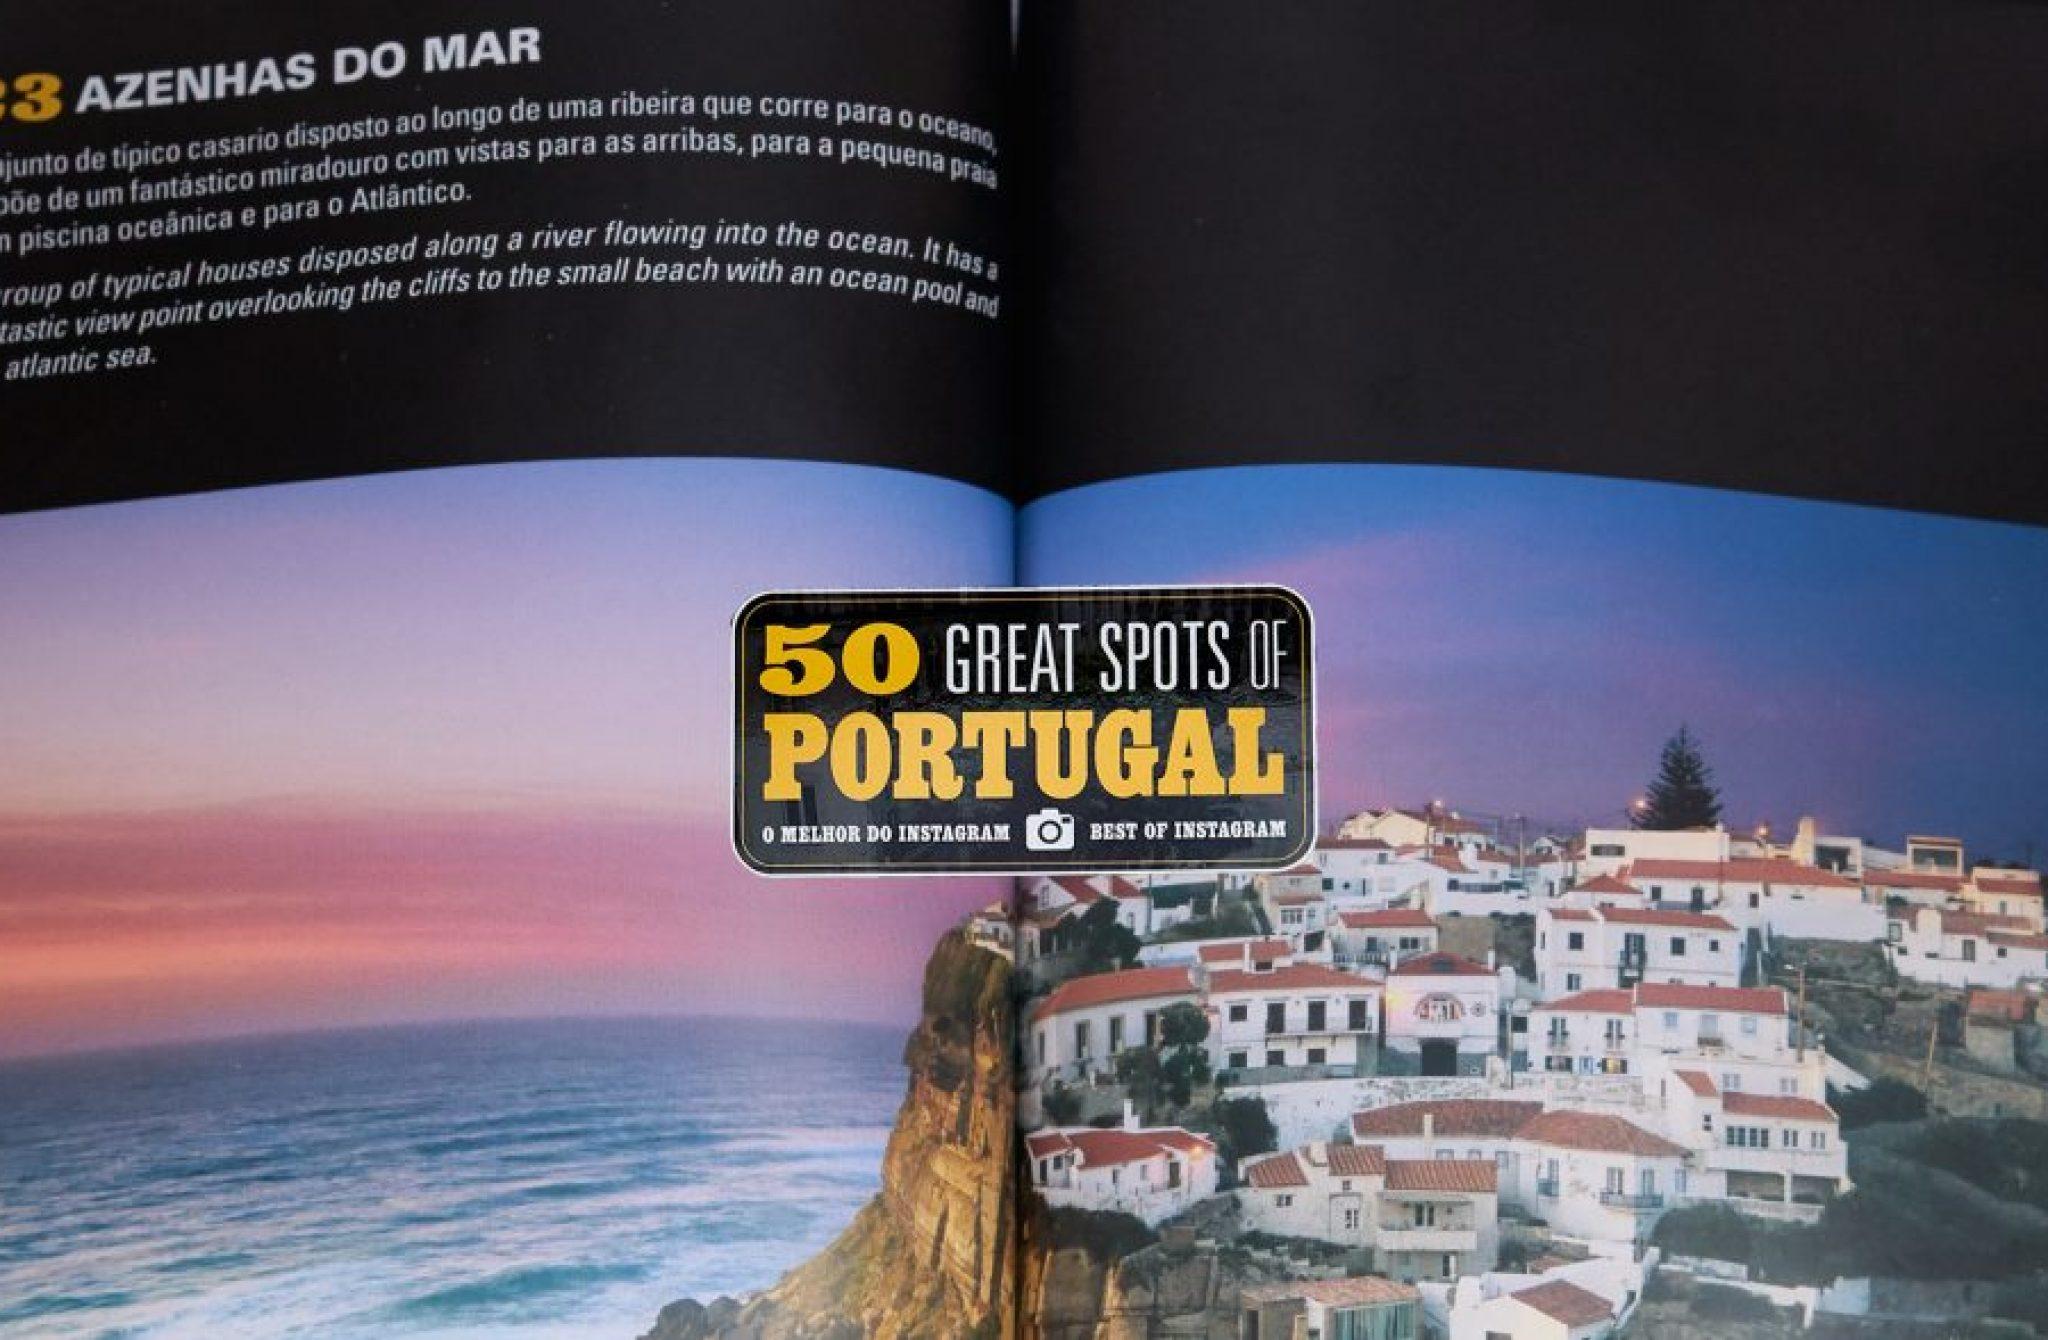 50 Great Spots of Portugal – Best Of Instagram